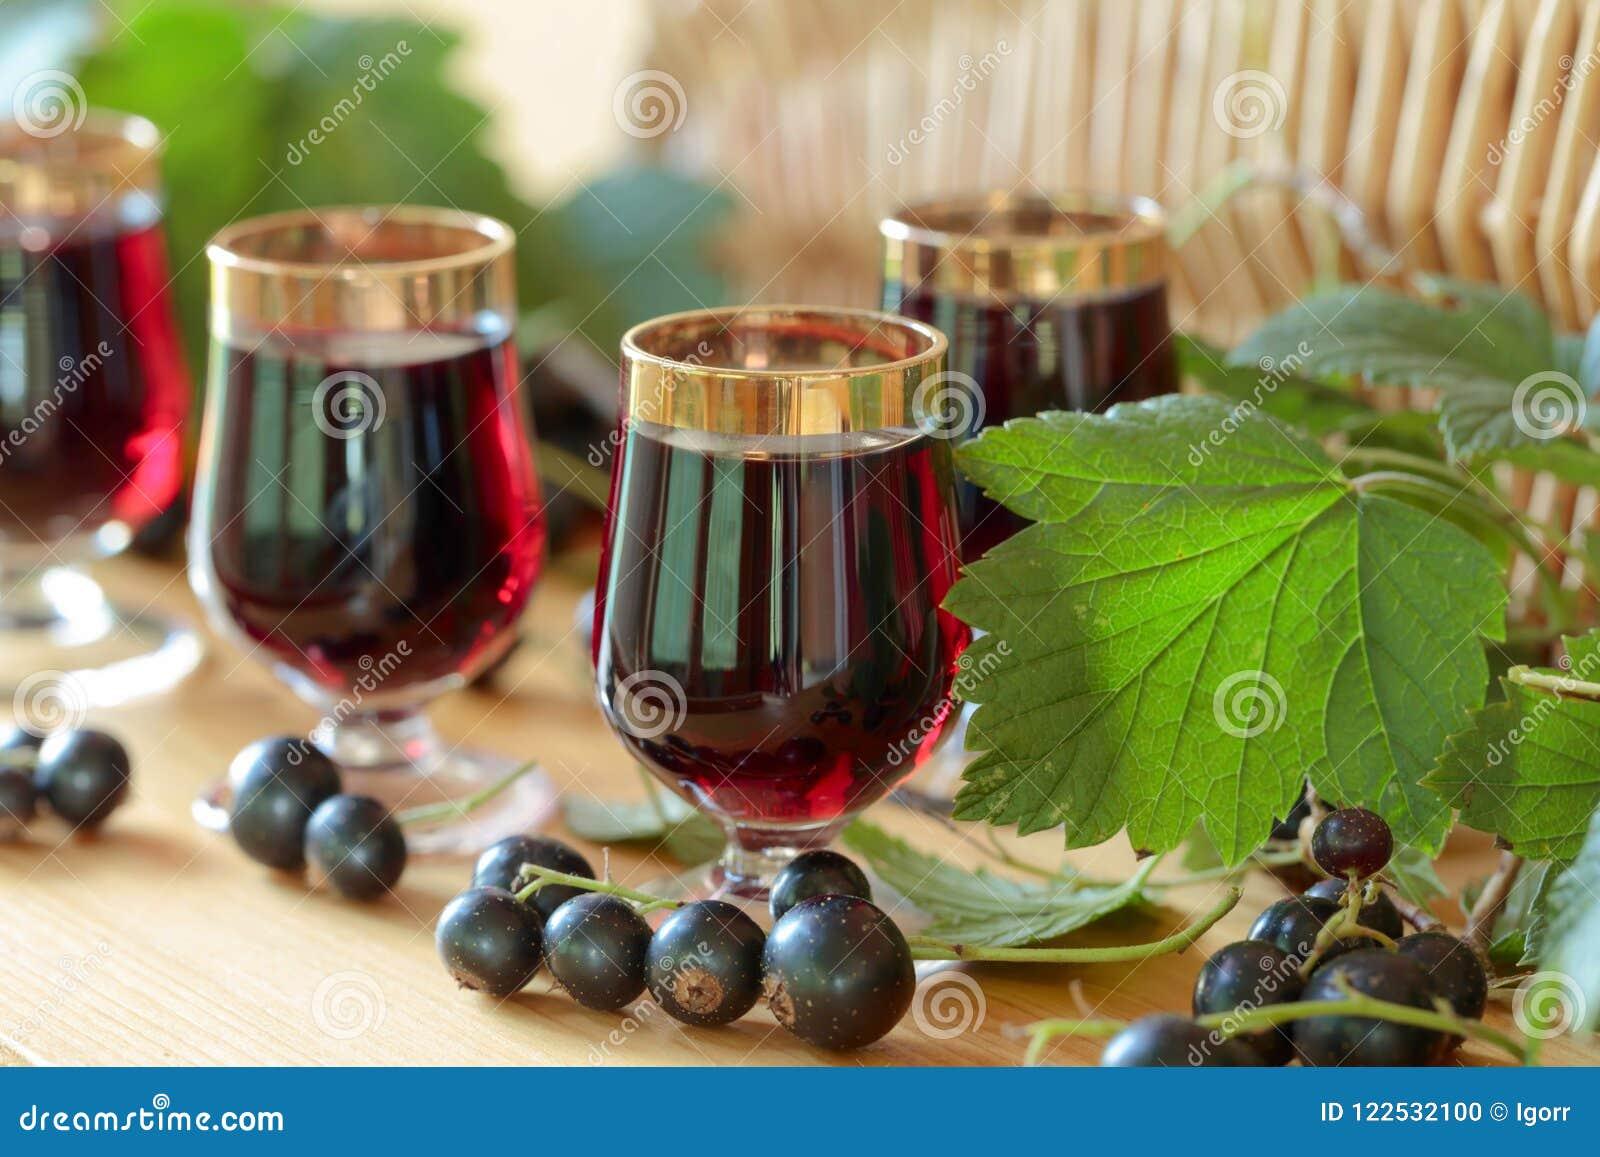 Homemade black currant liqueur and fresh berries.